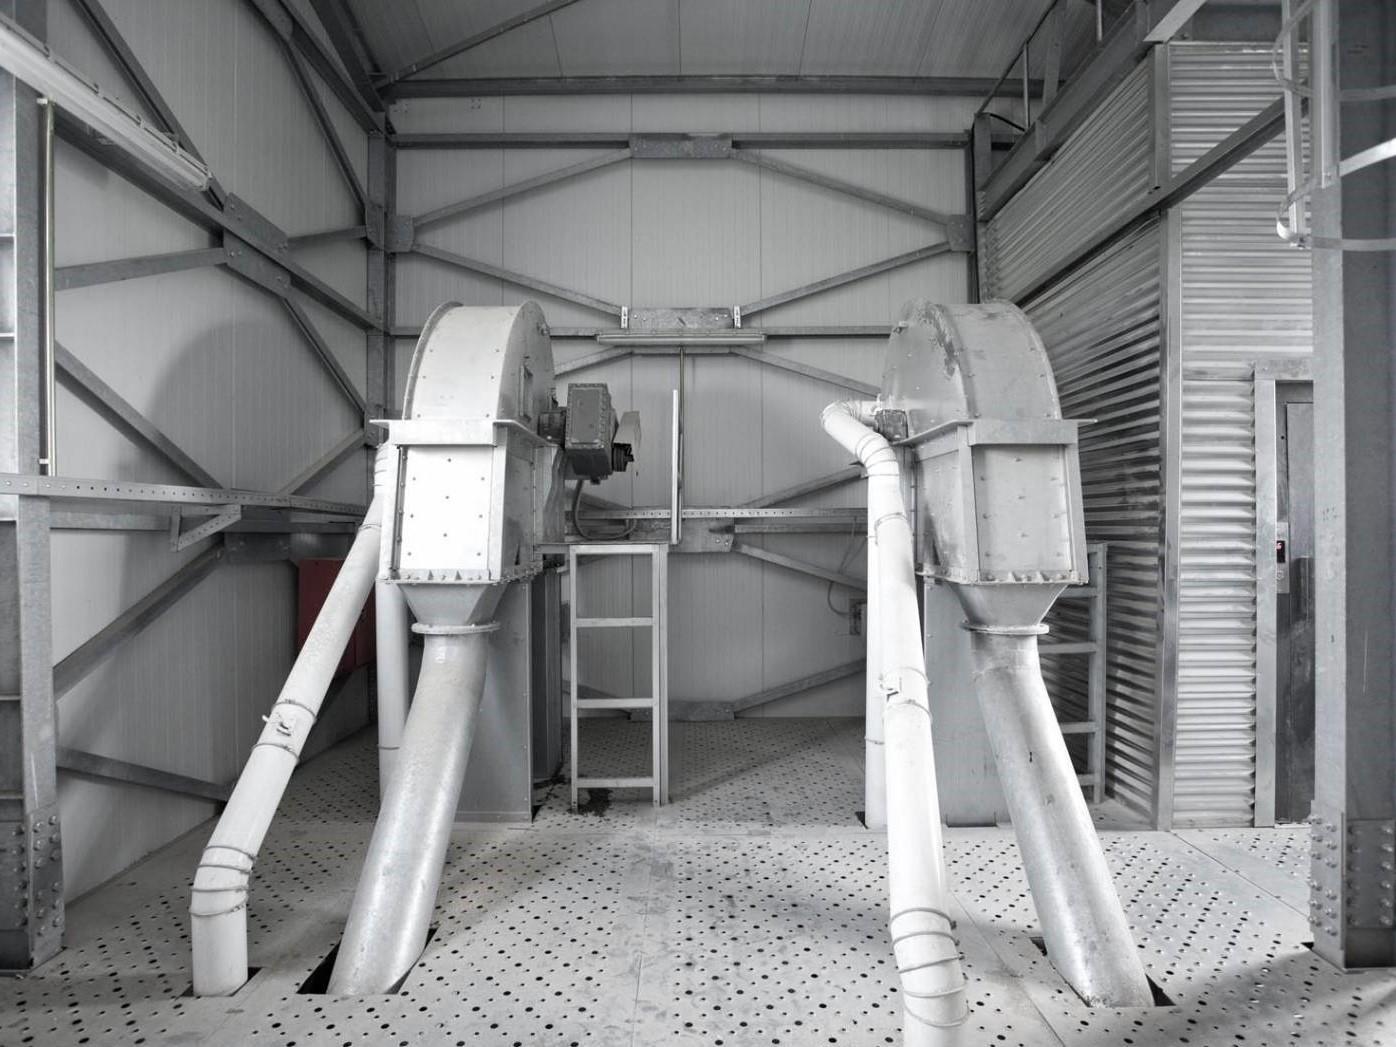 Элеватор жби бронеавтомобиль транспортер